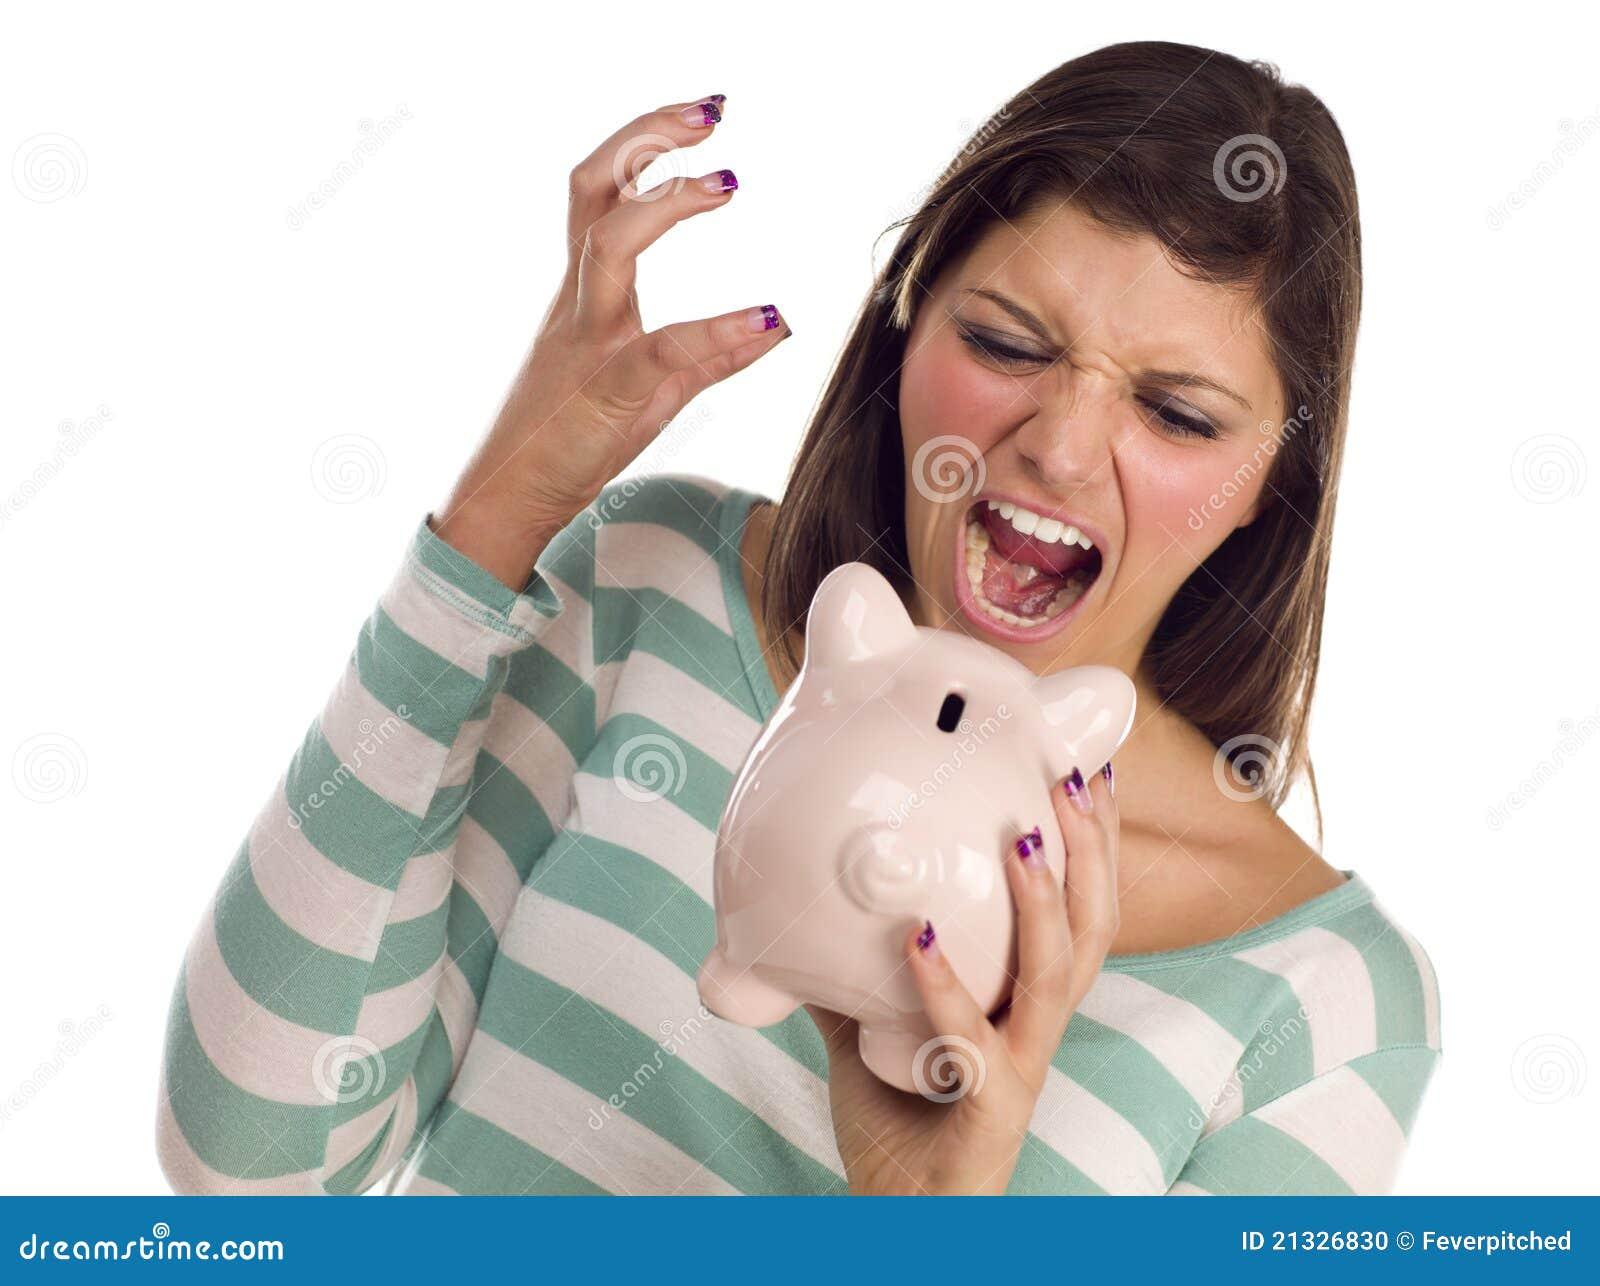 Ethnic Female Yelling At Piggy Bank on White